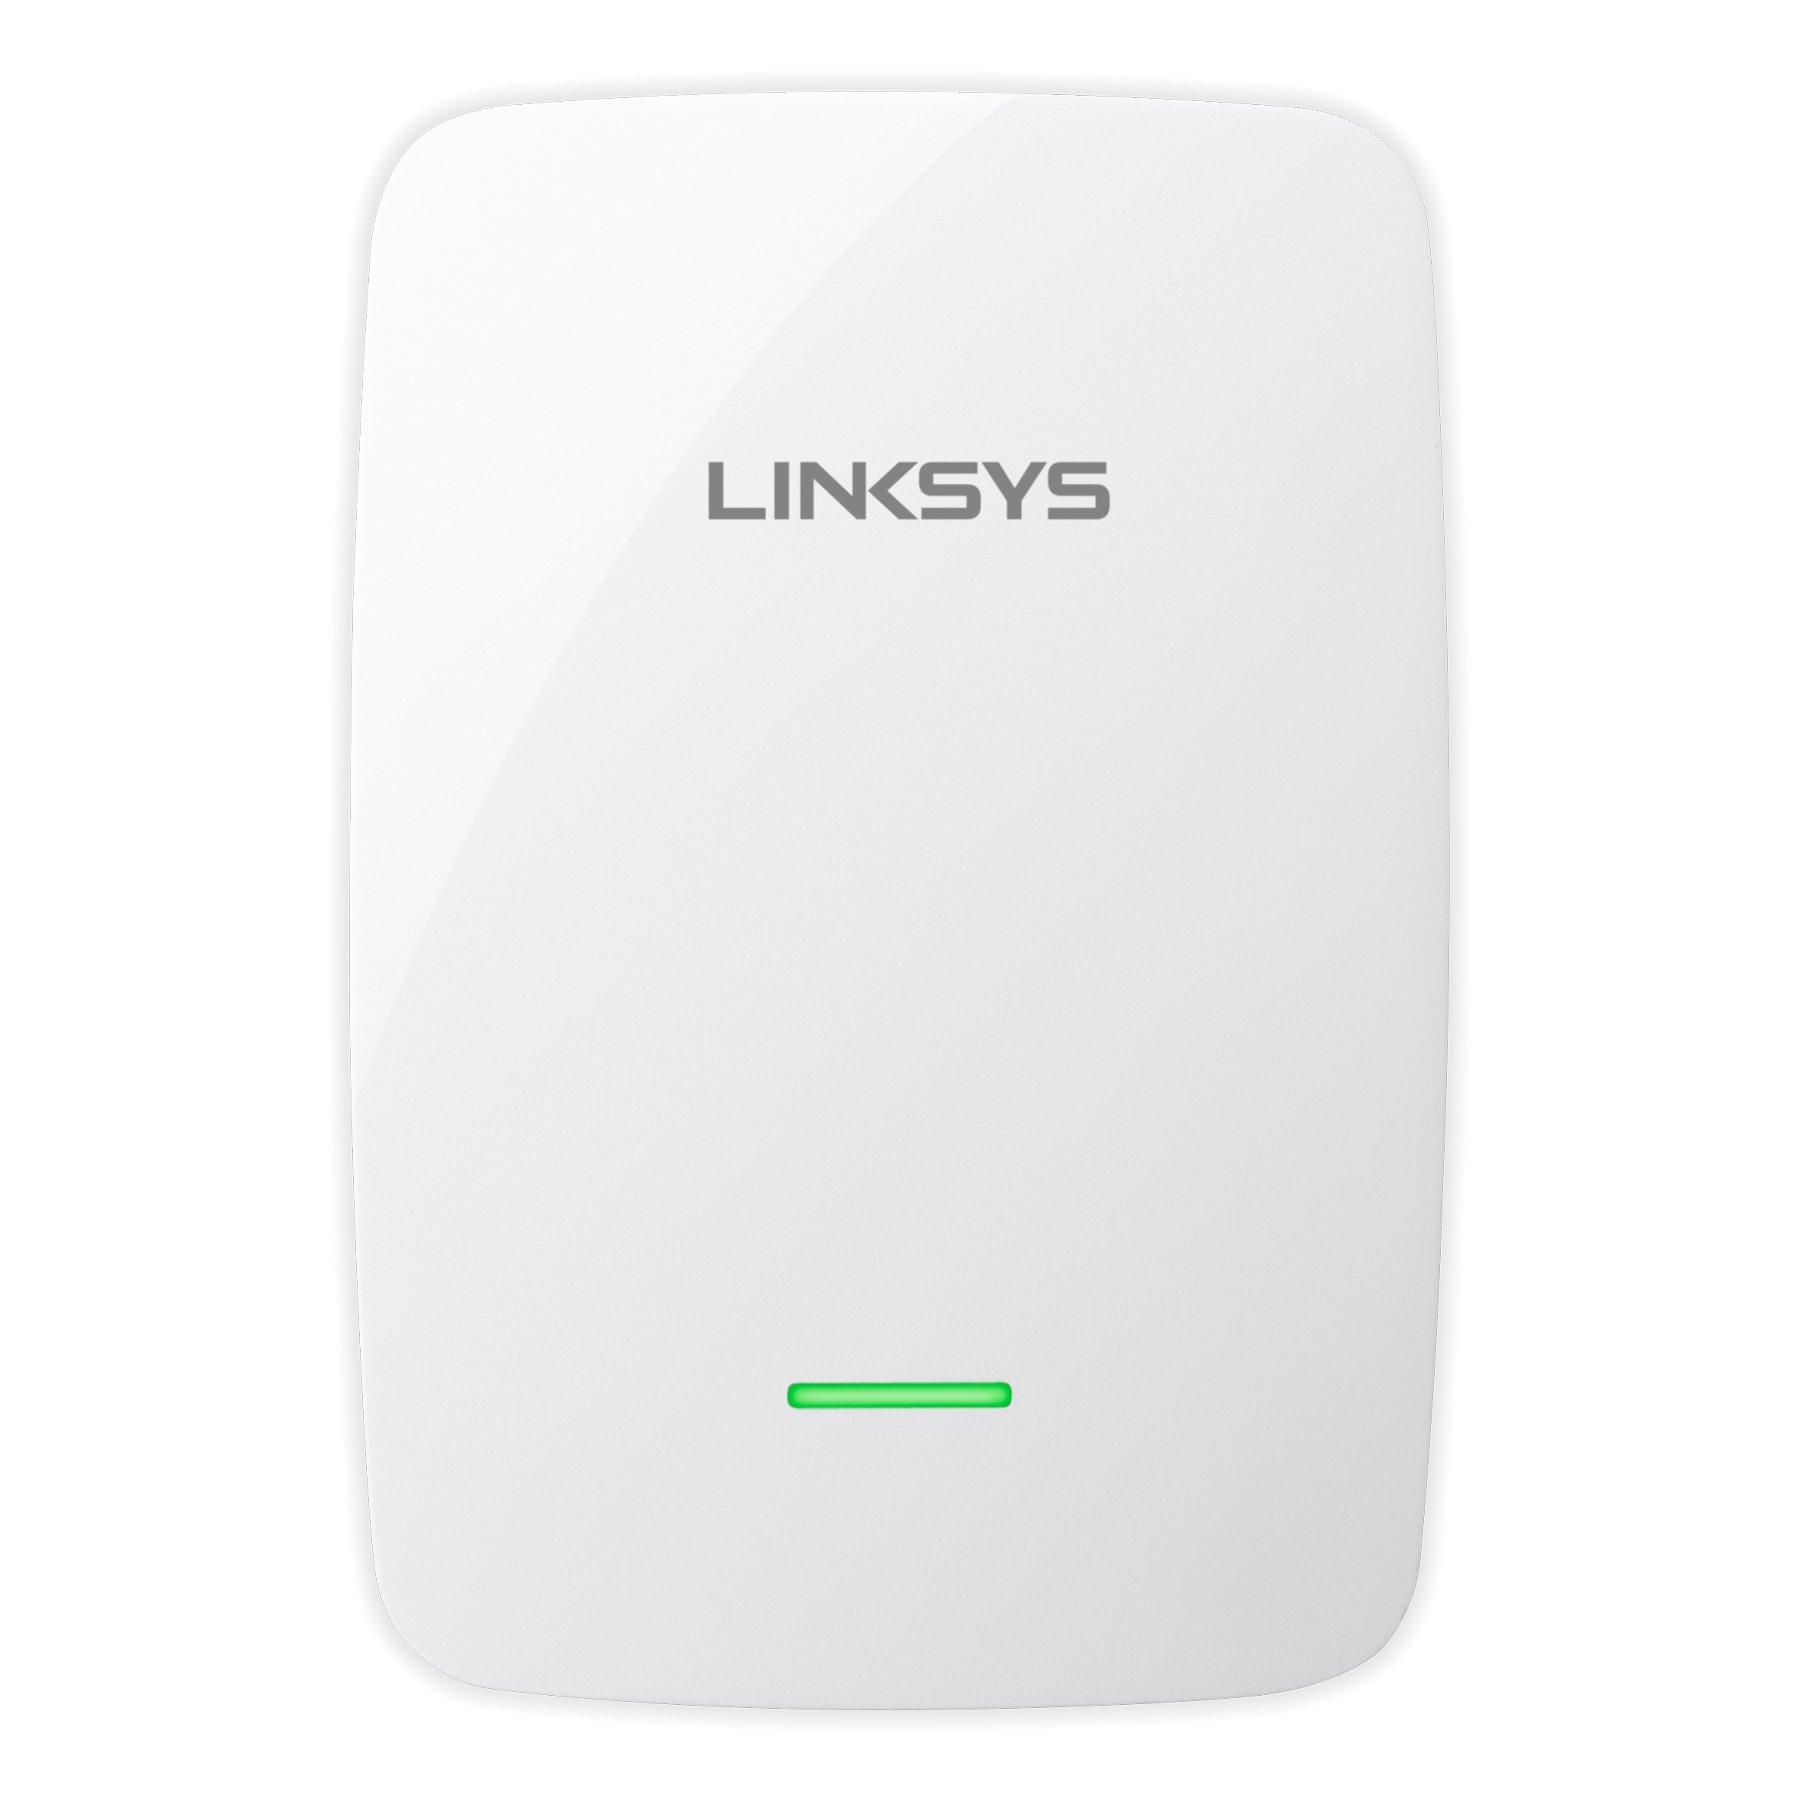 Linksys N600 Pro Dual-Band WiFi Range Extender by Linksys